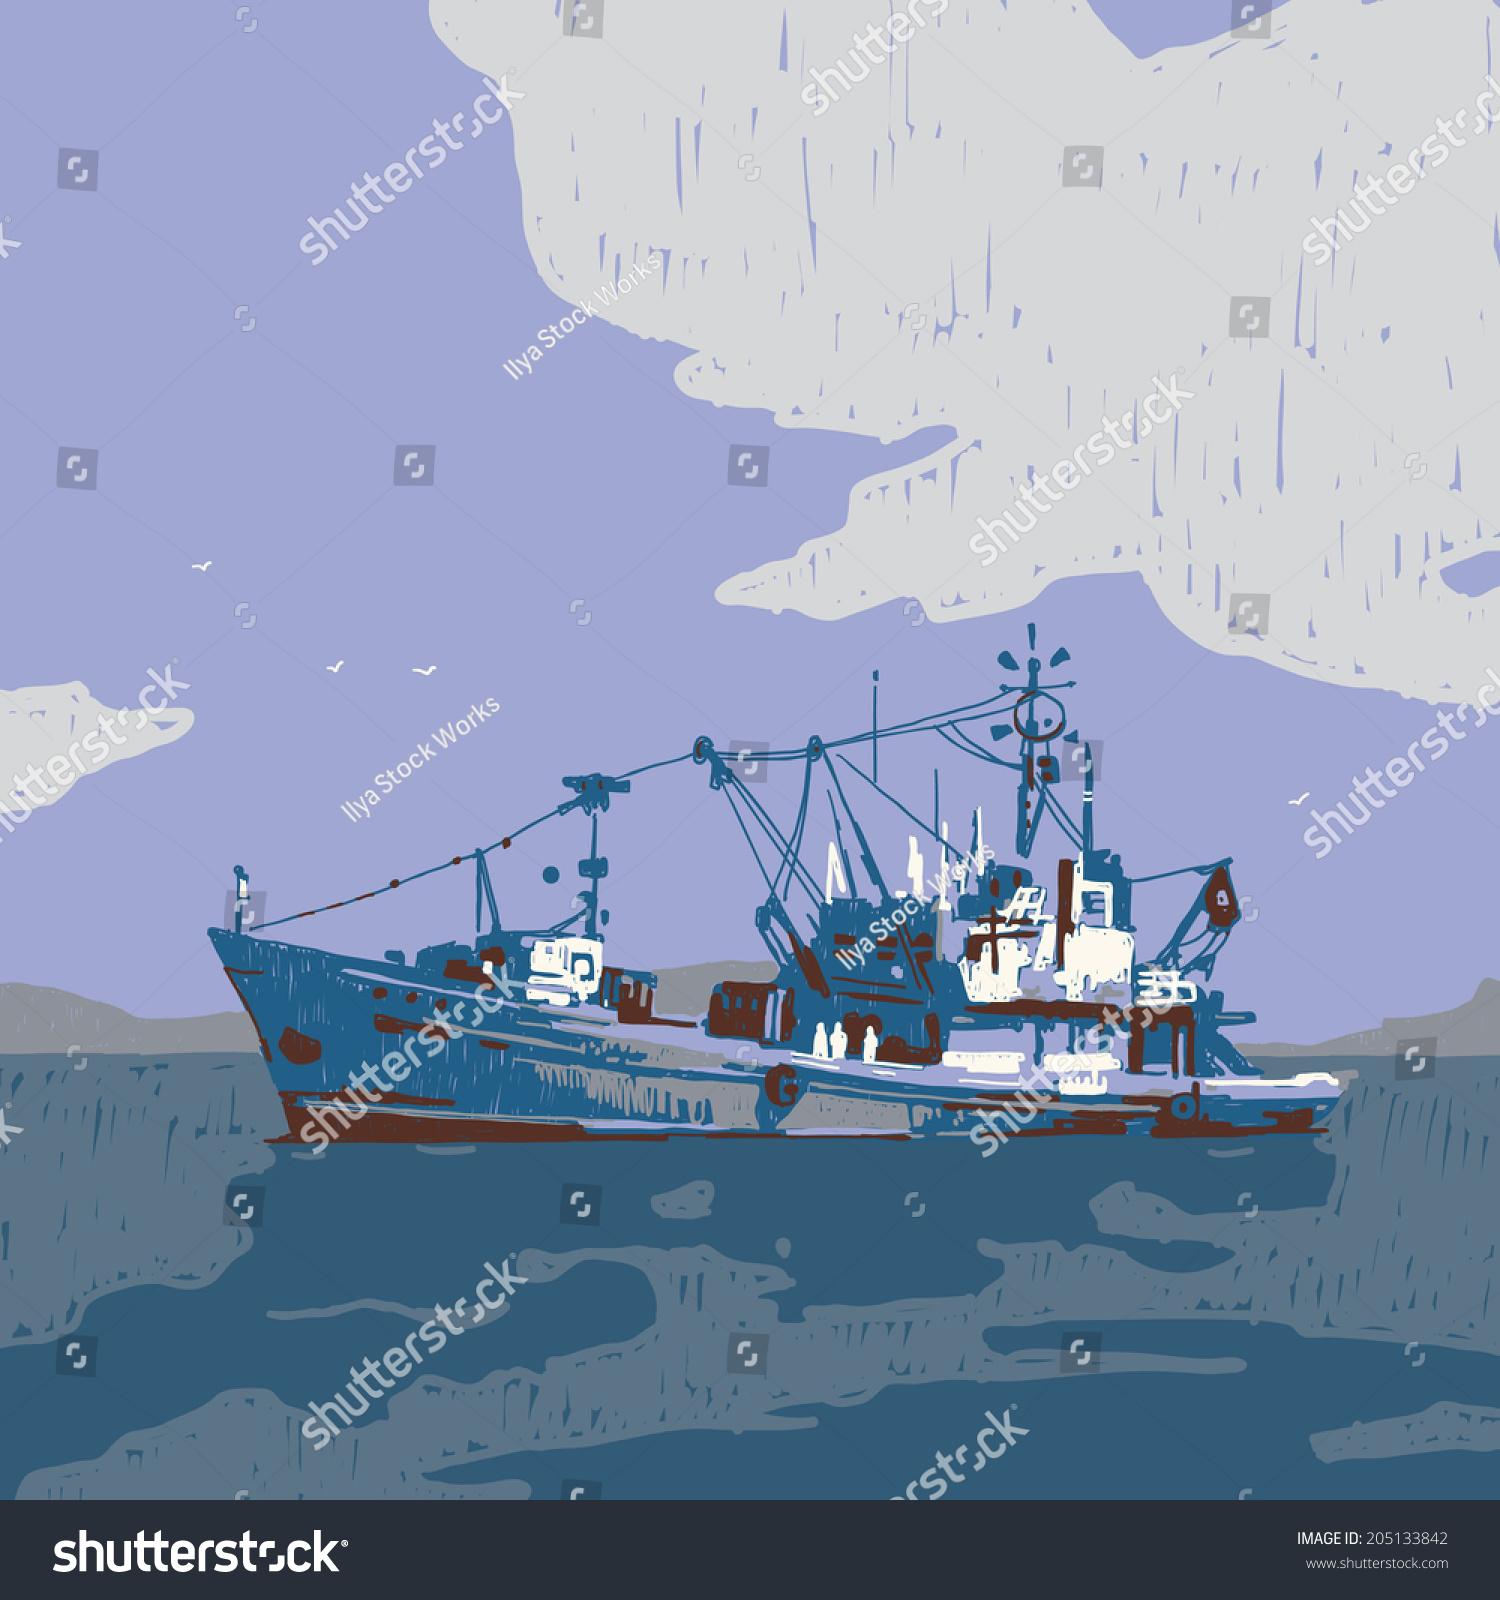 Small Fishing Boat Graphic Illustration